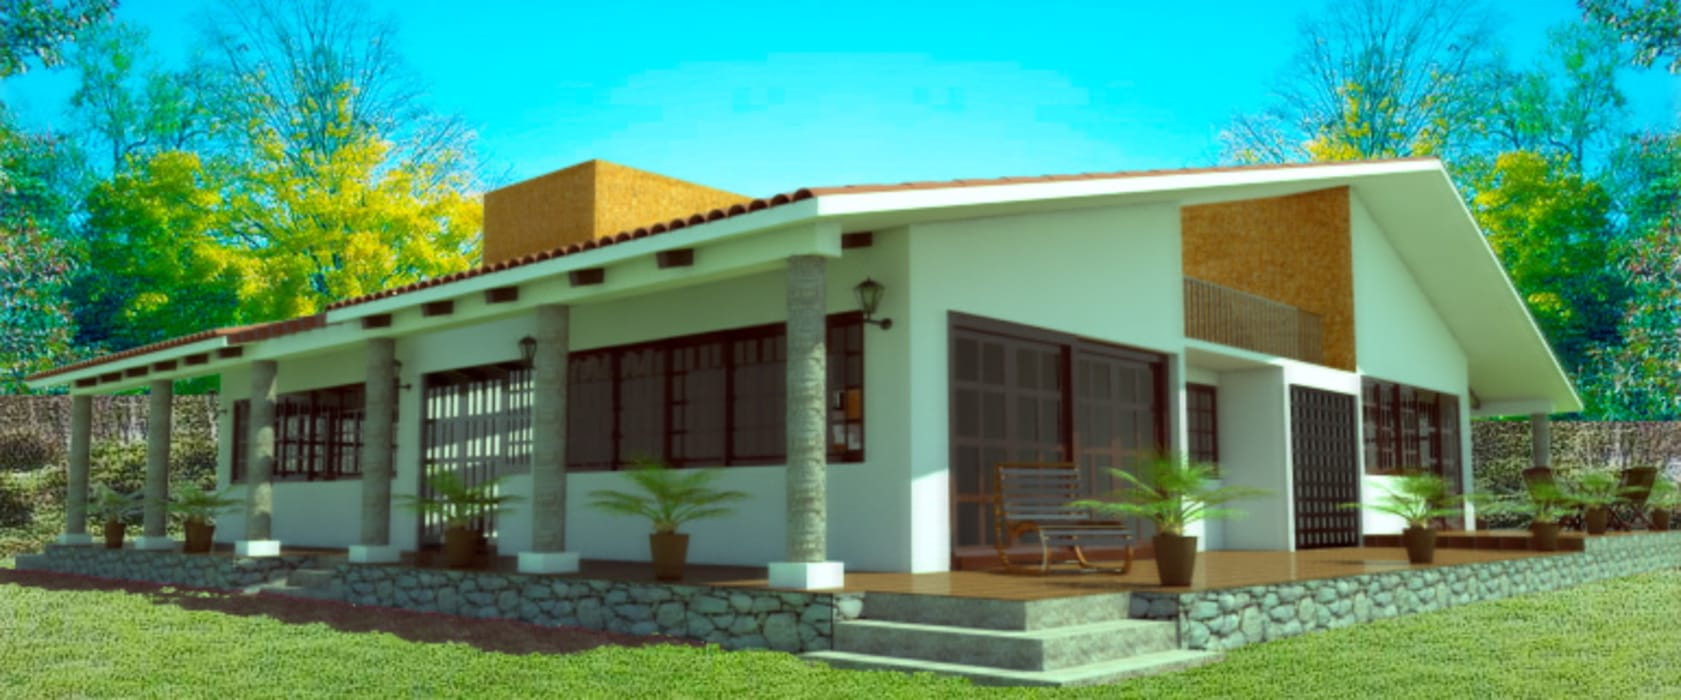 Fachada lateral: Casas de estilo rústico por PRISMA ARQUITECTOS